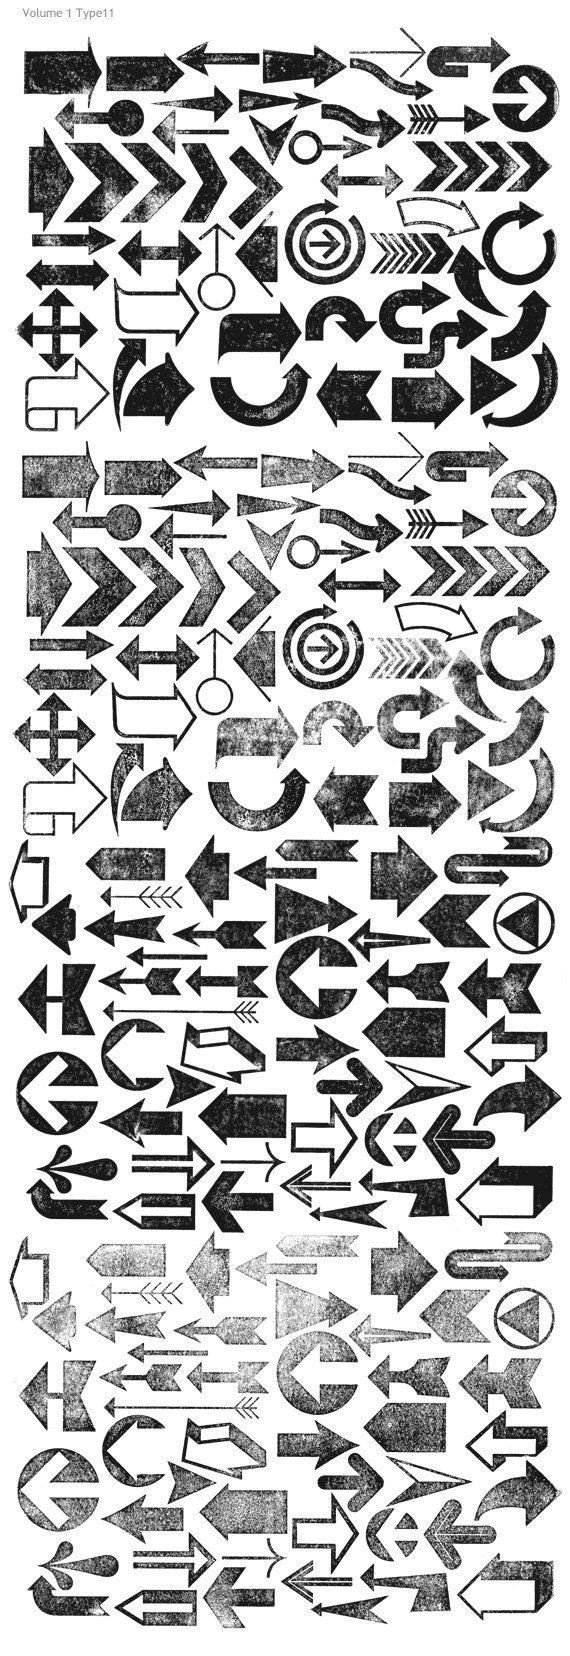 Distressed Arrows & Arrowheads an array of symbol marks